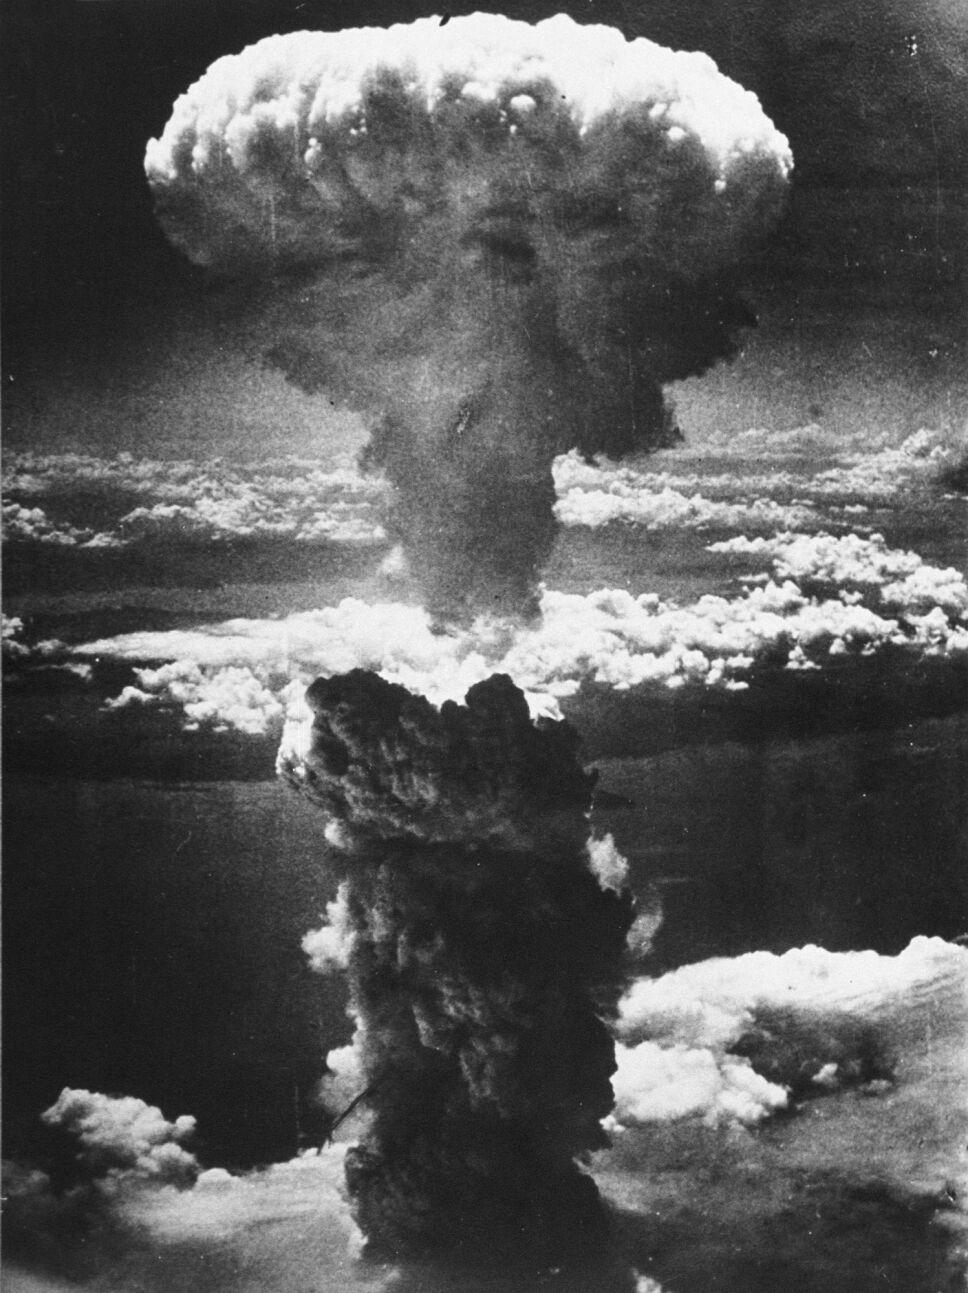 Explosión nuclear en Nagasaki, tres días después de que el ejército estadounidense redujera a escombros Hiroshima